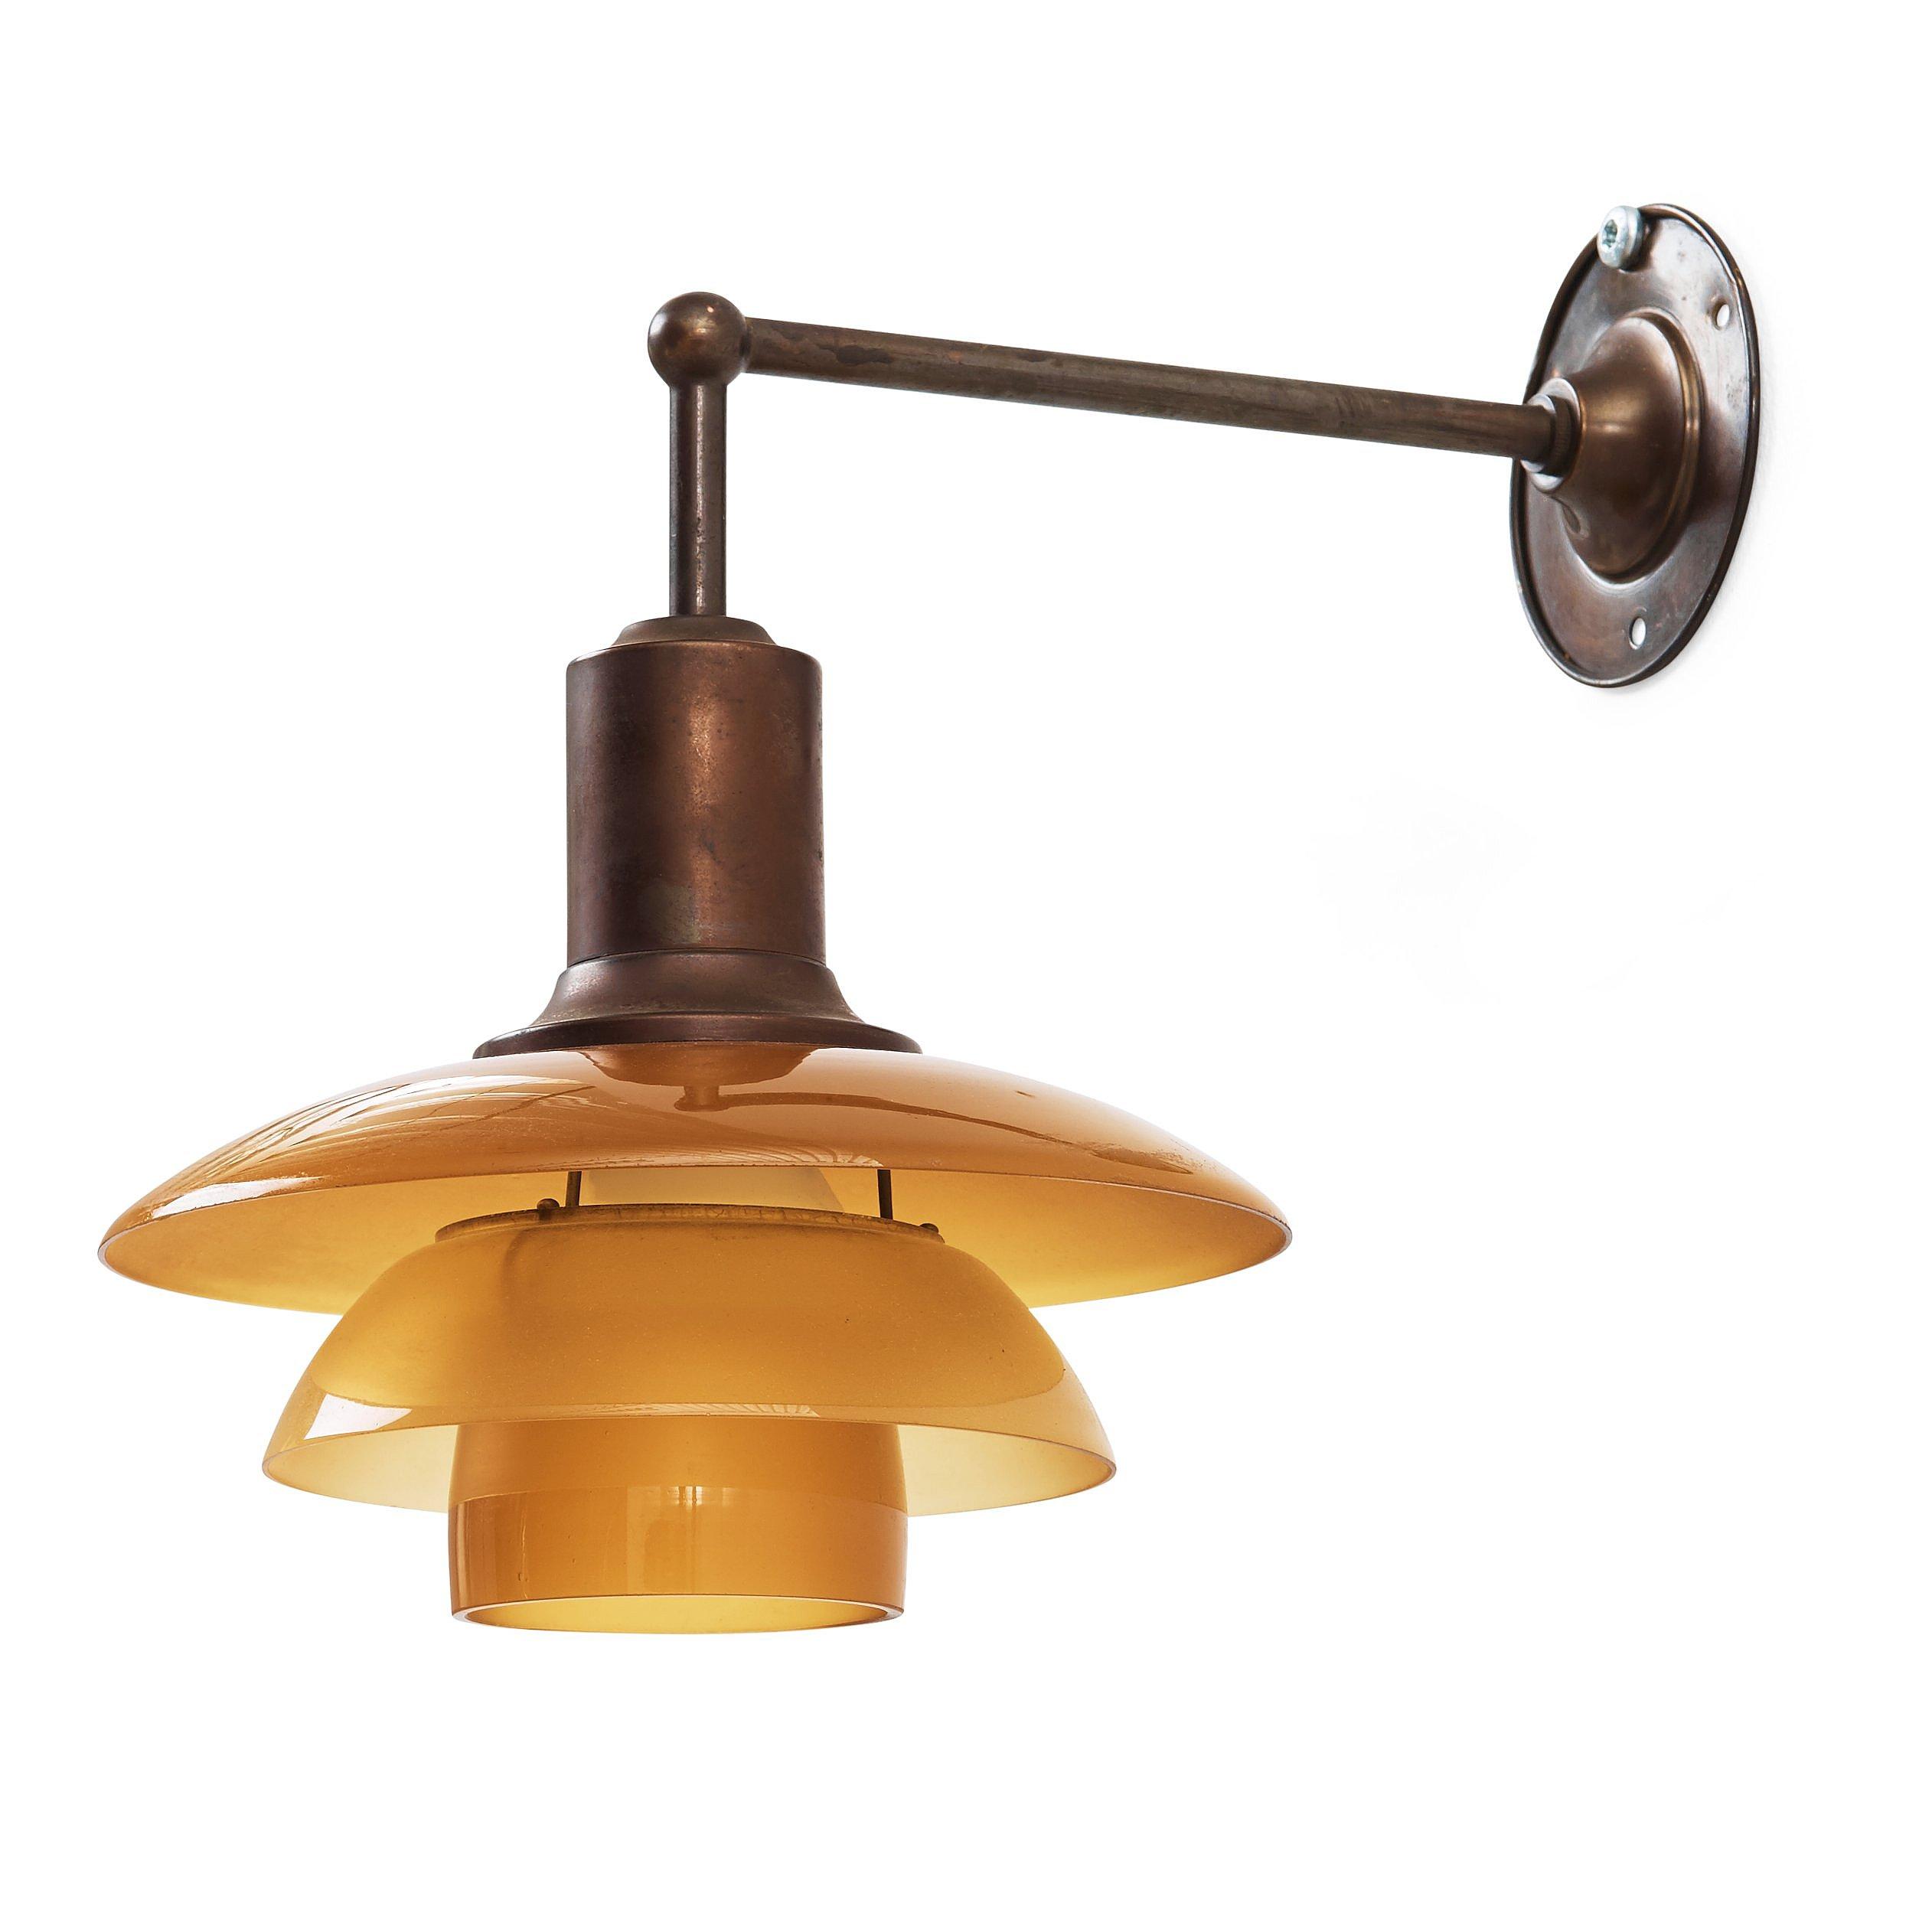 Poul henningsen a ph 22 wall lamp with amber coloured glass poul henningsen a ph 22 wall lamp with amber coloured glass shades louis poulsen denmark 1930s bukowskis aloadofball Gallery